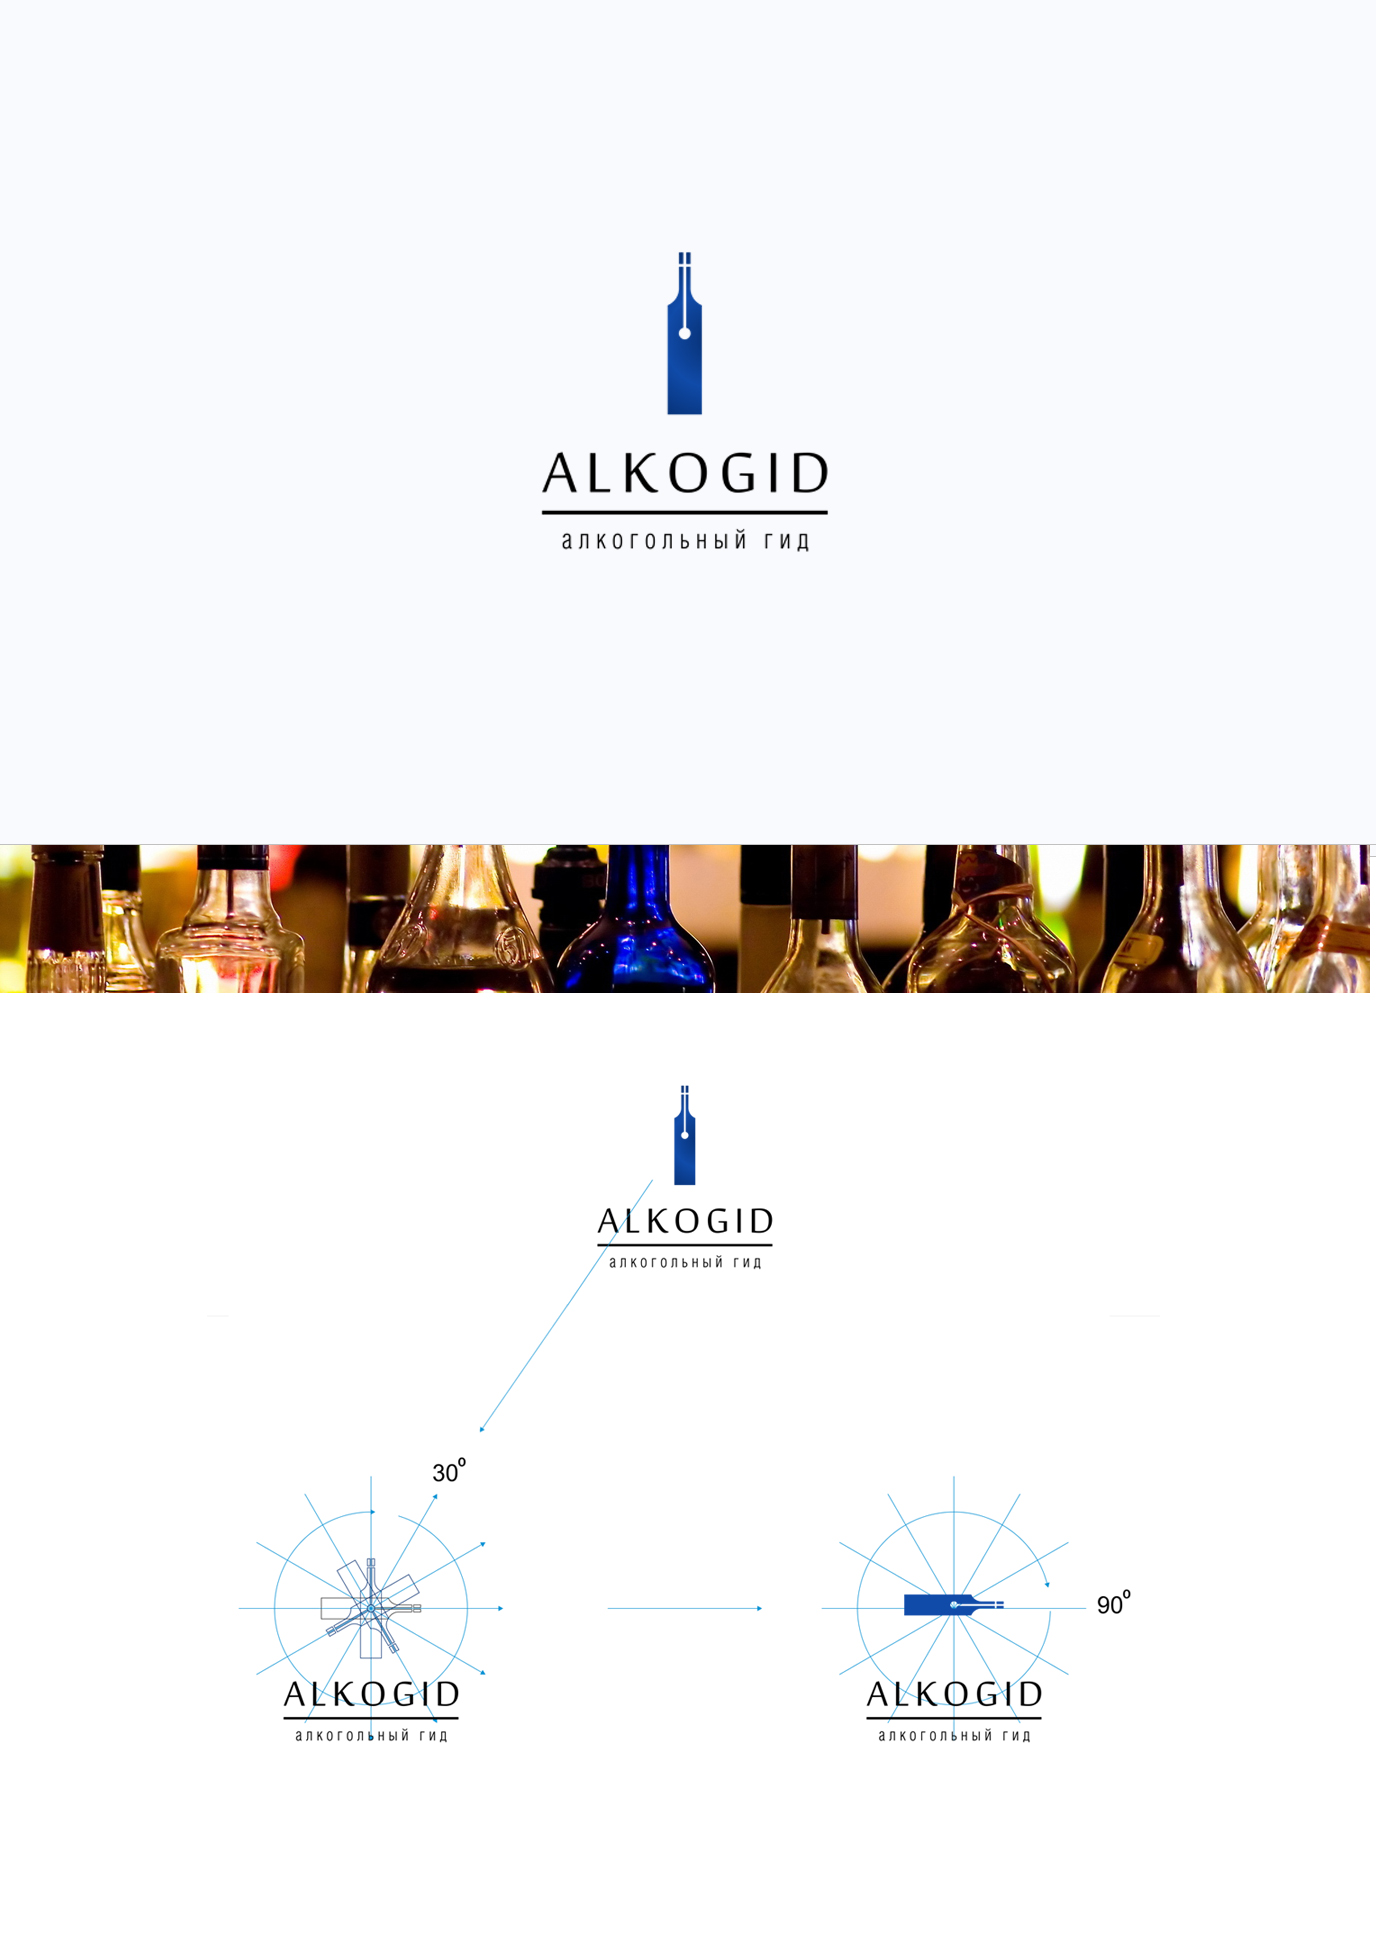 http://id1.ru/wp-content/uploads/2015/09/alkogid.jpg